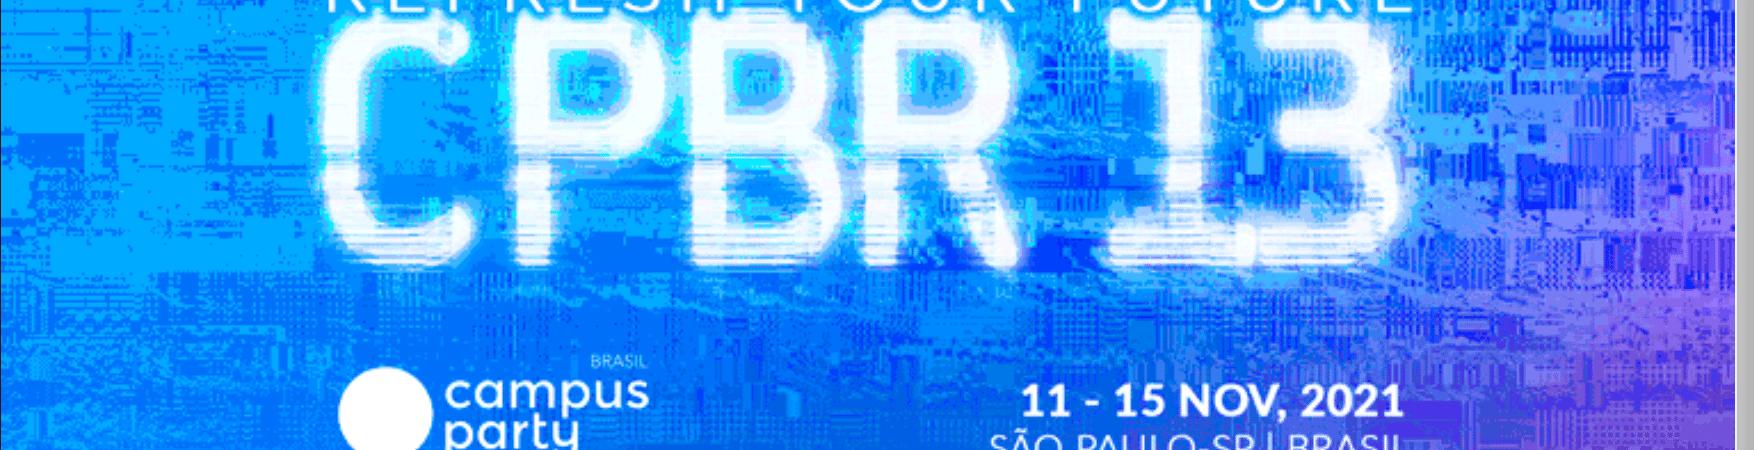 Campus Party CPBR13